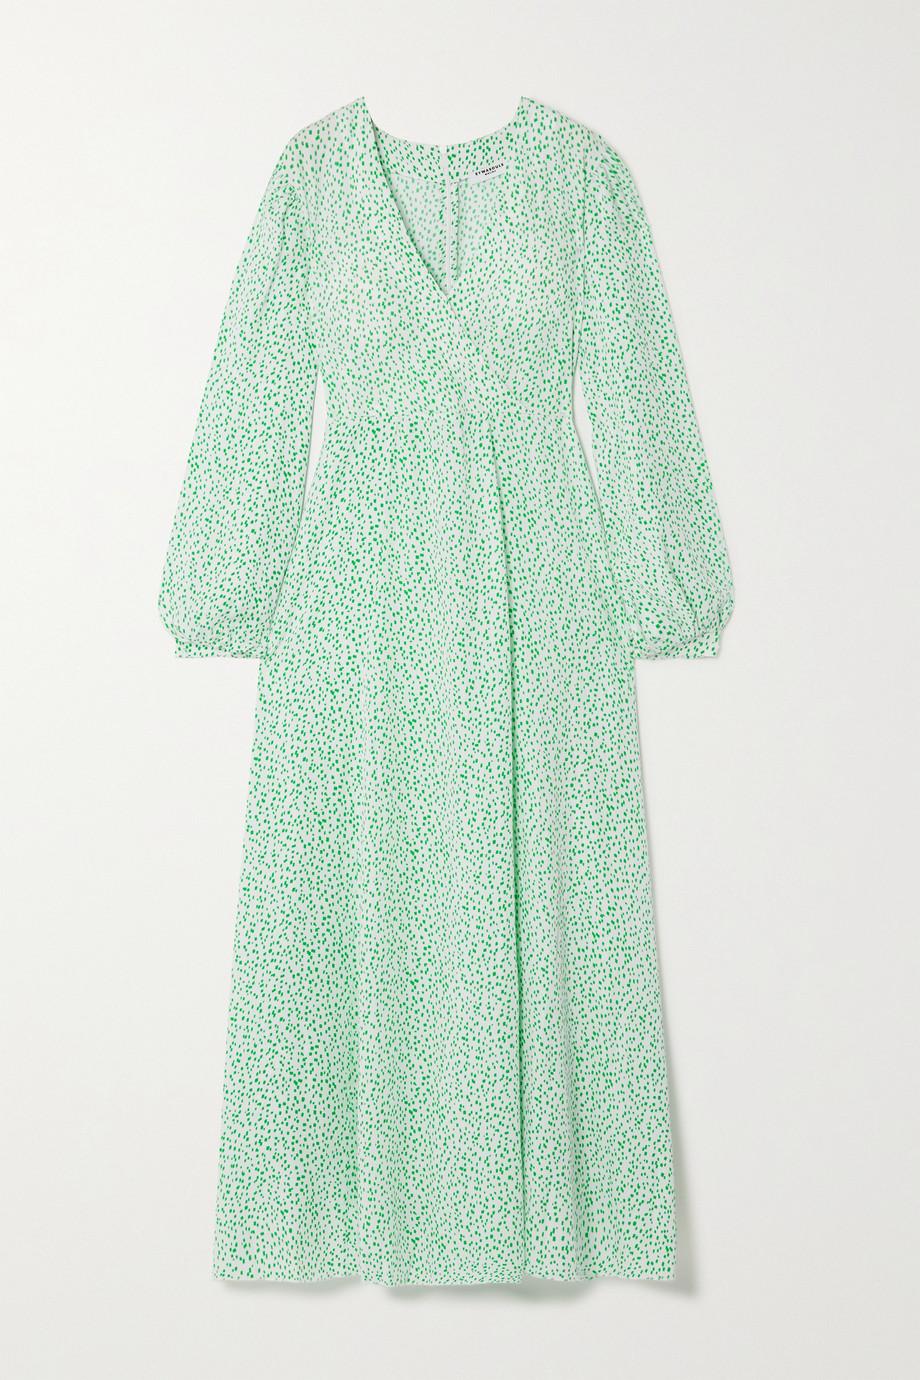 Eywasouls Malibu Robe longue effet portefeuille en serge de Lyocell TENCEL imprimée Elsa